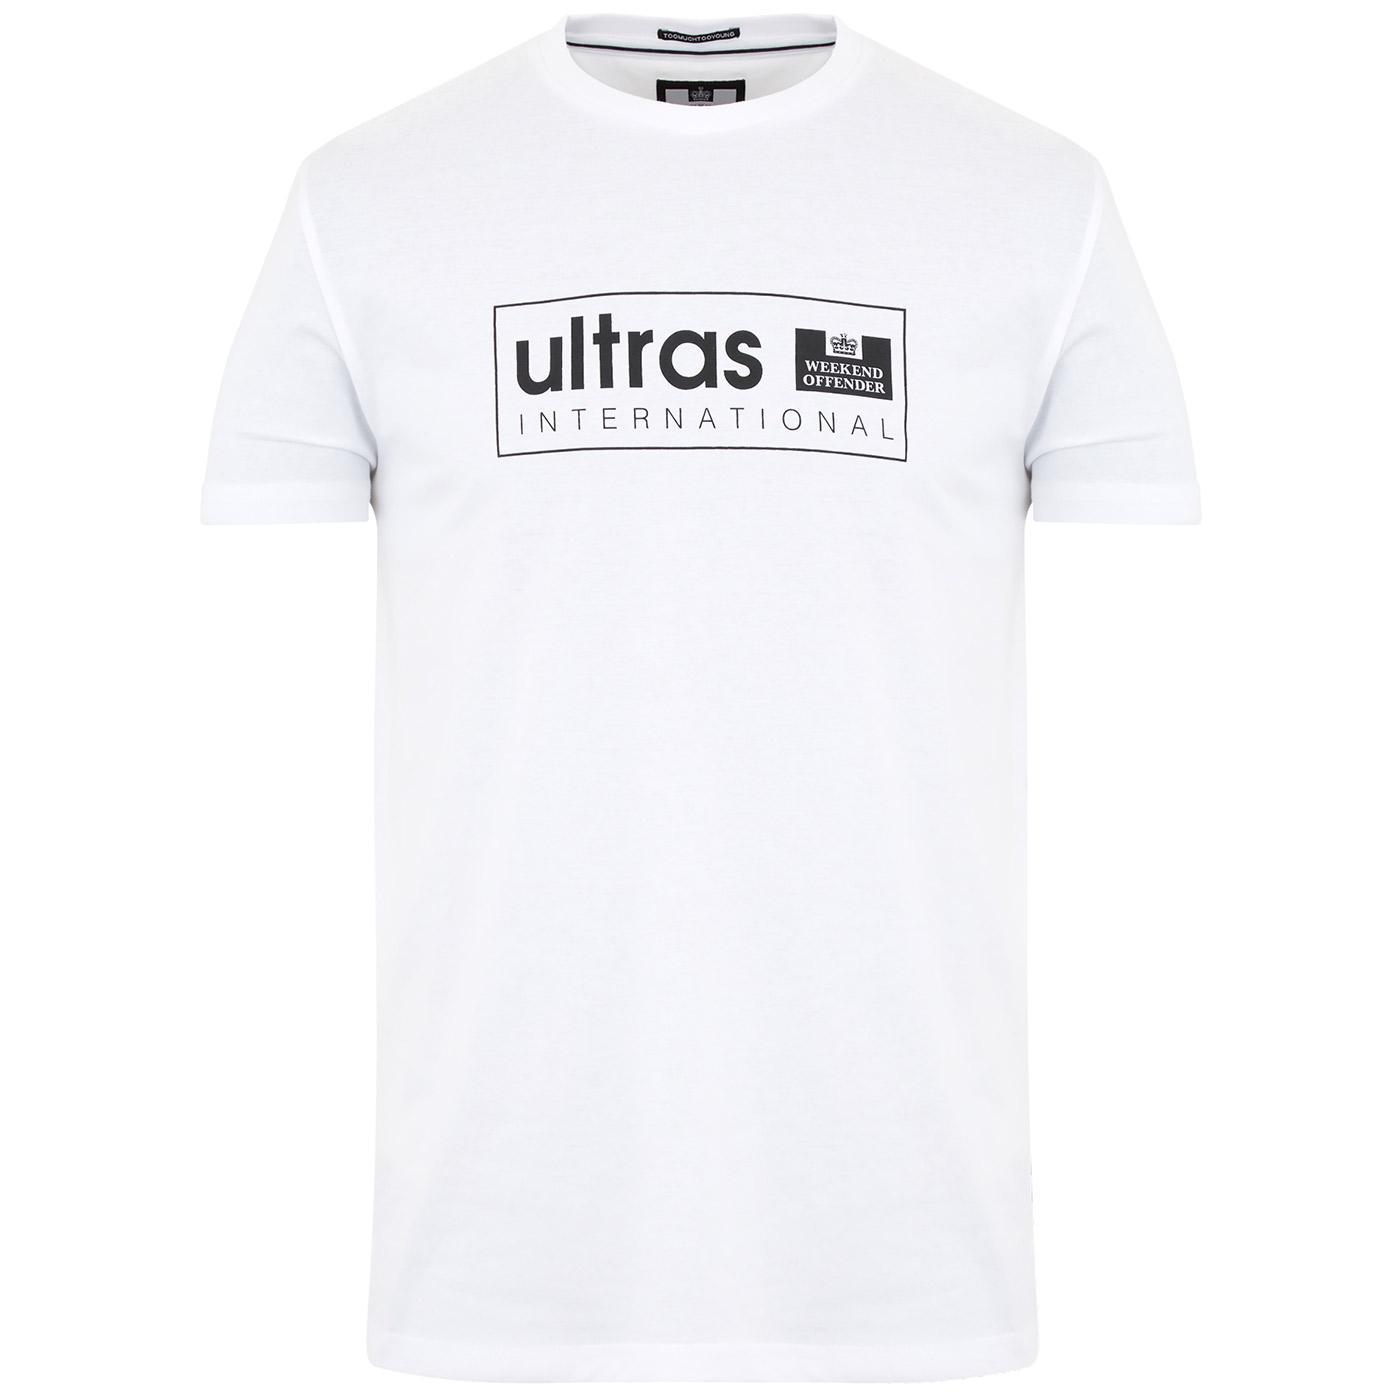 Ultras WEEKEND OFFENDER Retro Casuals Tee (W)